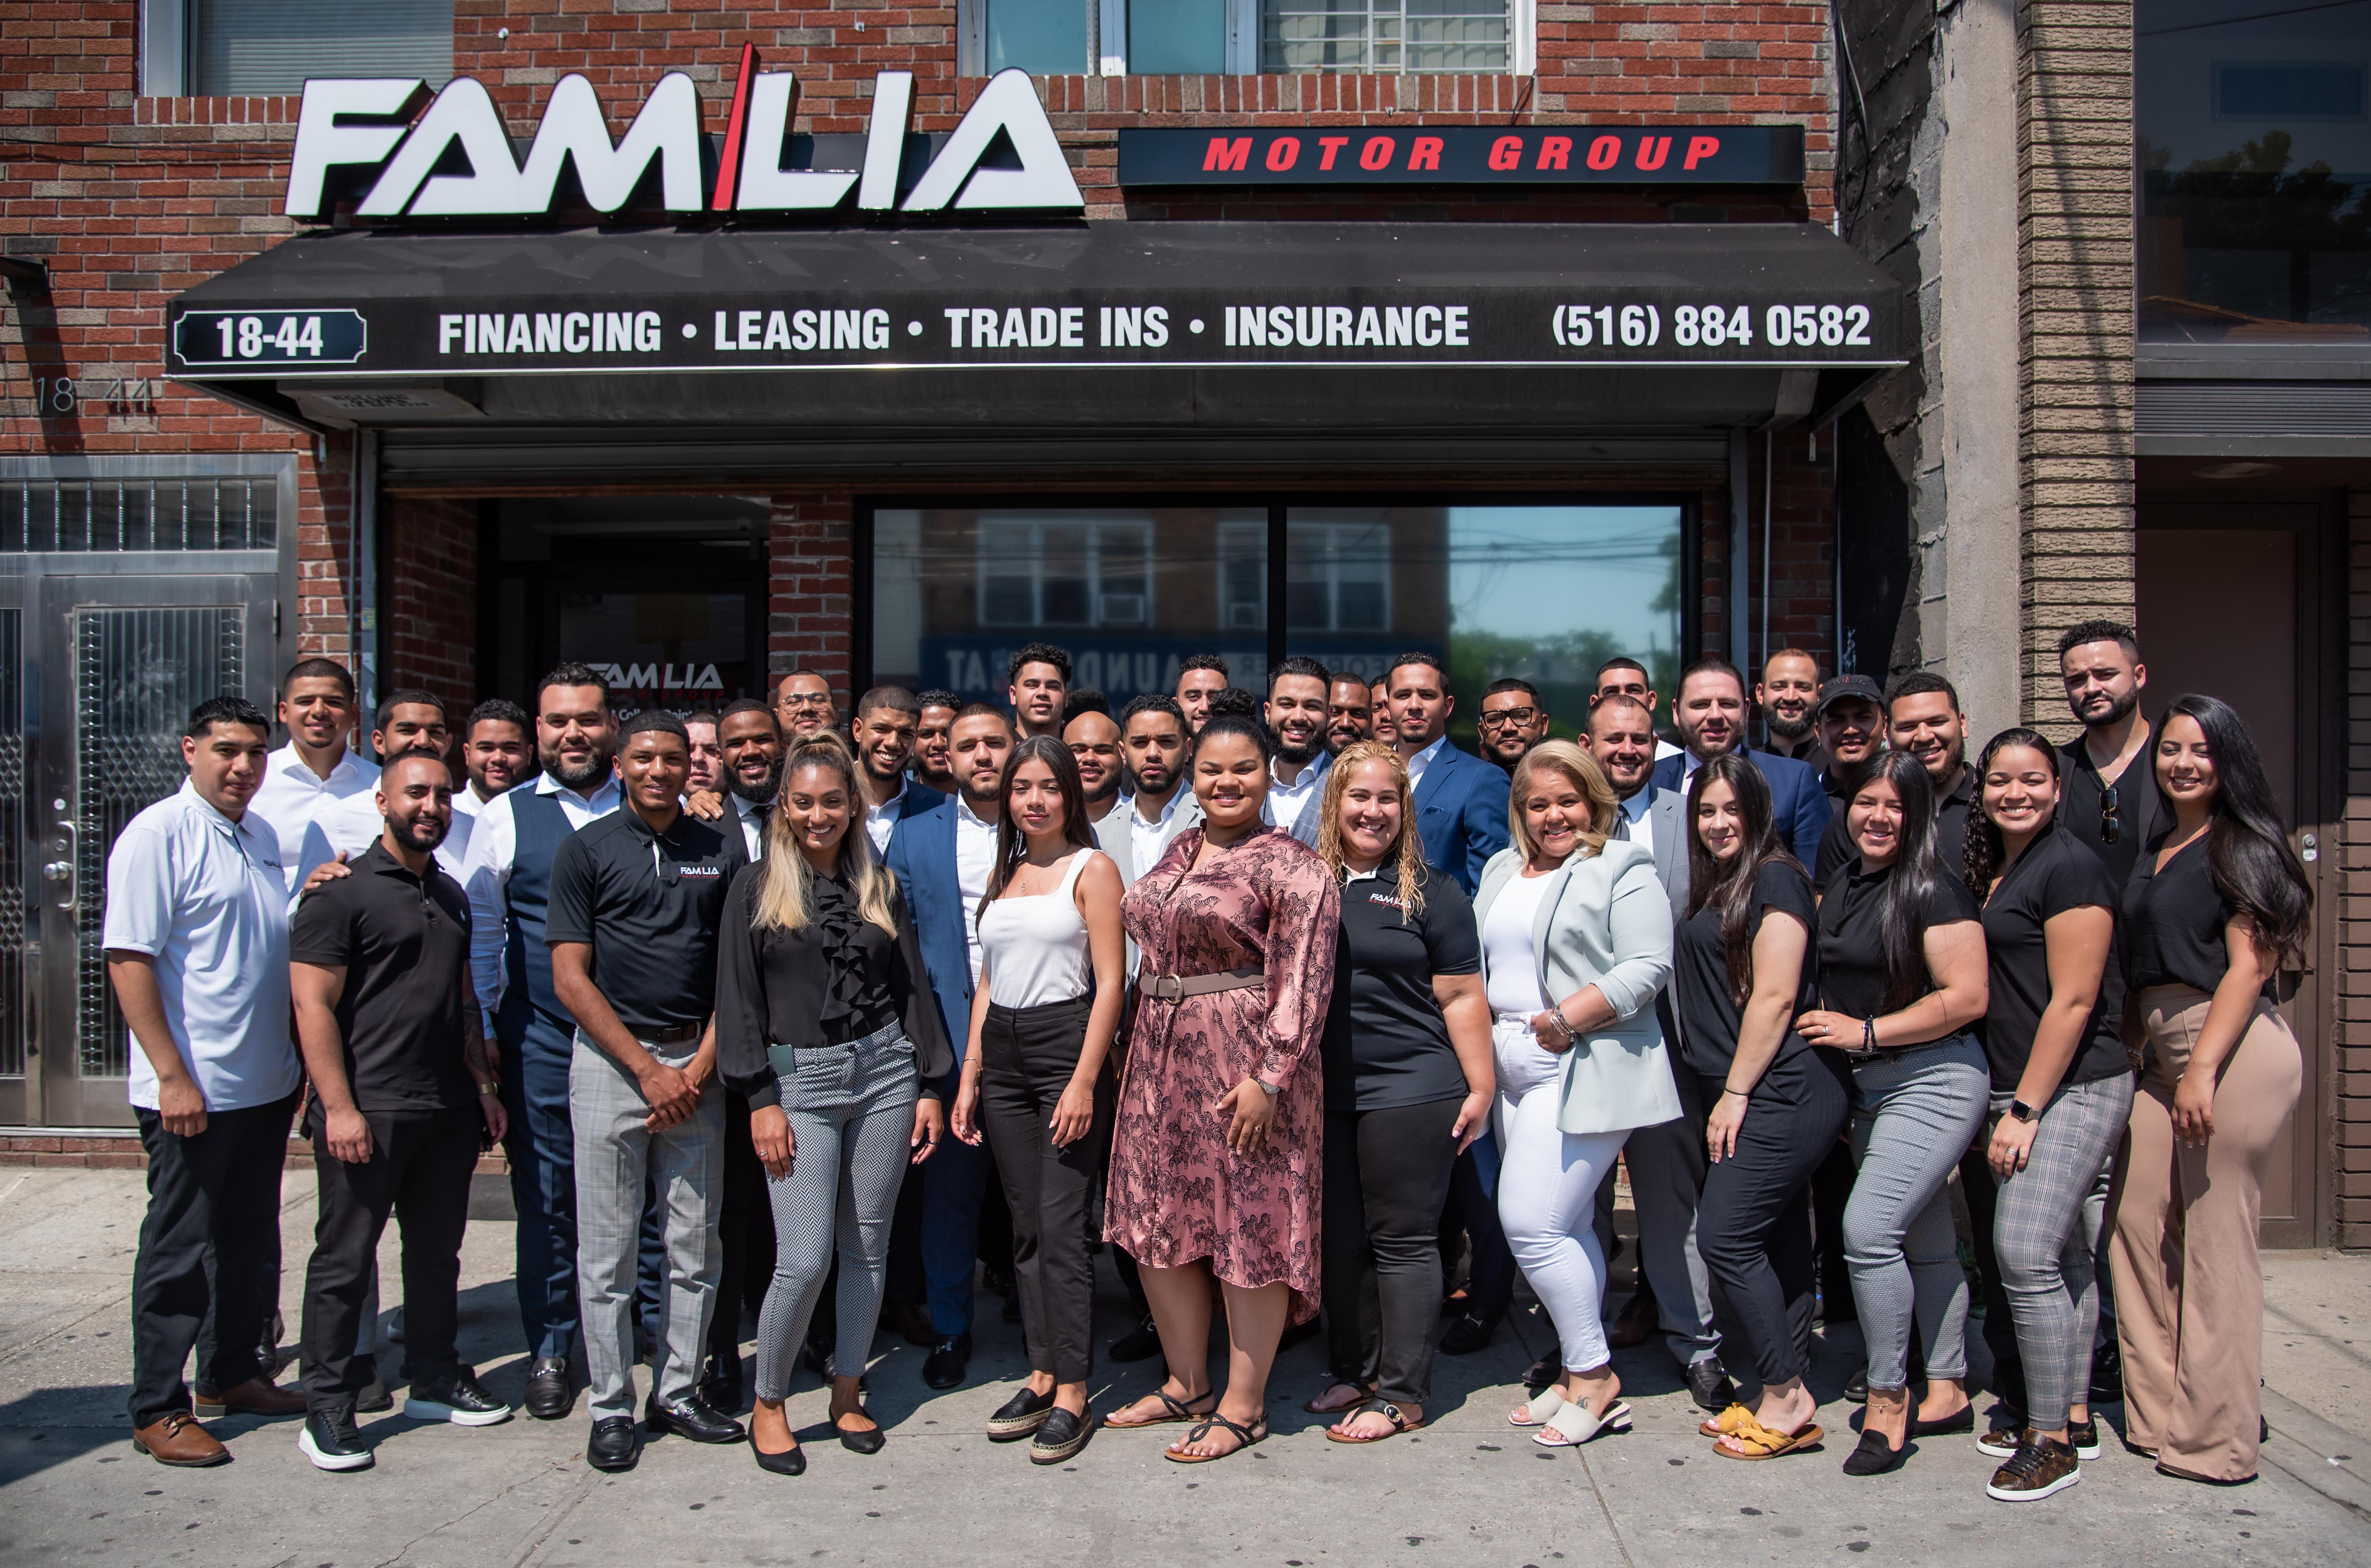 #1 Auto Broker in New York City, Familia Motor Group, Donates to the Needy